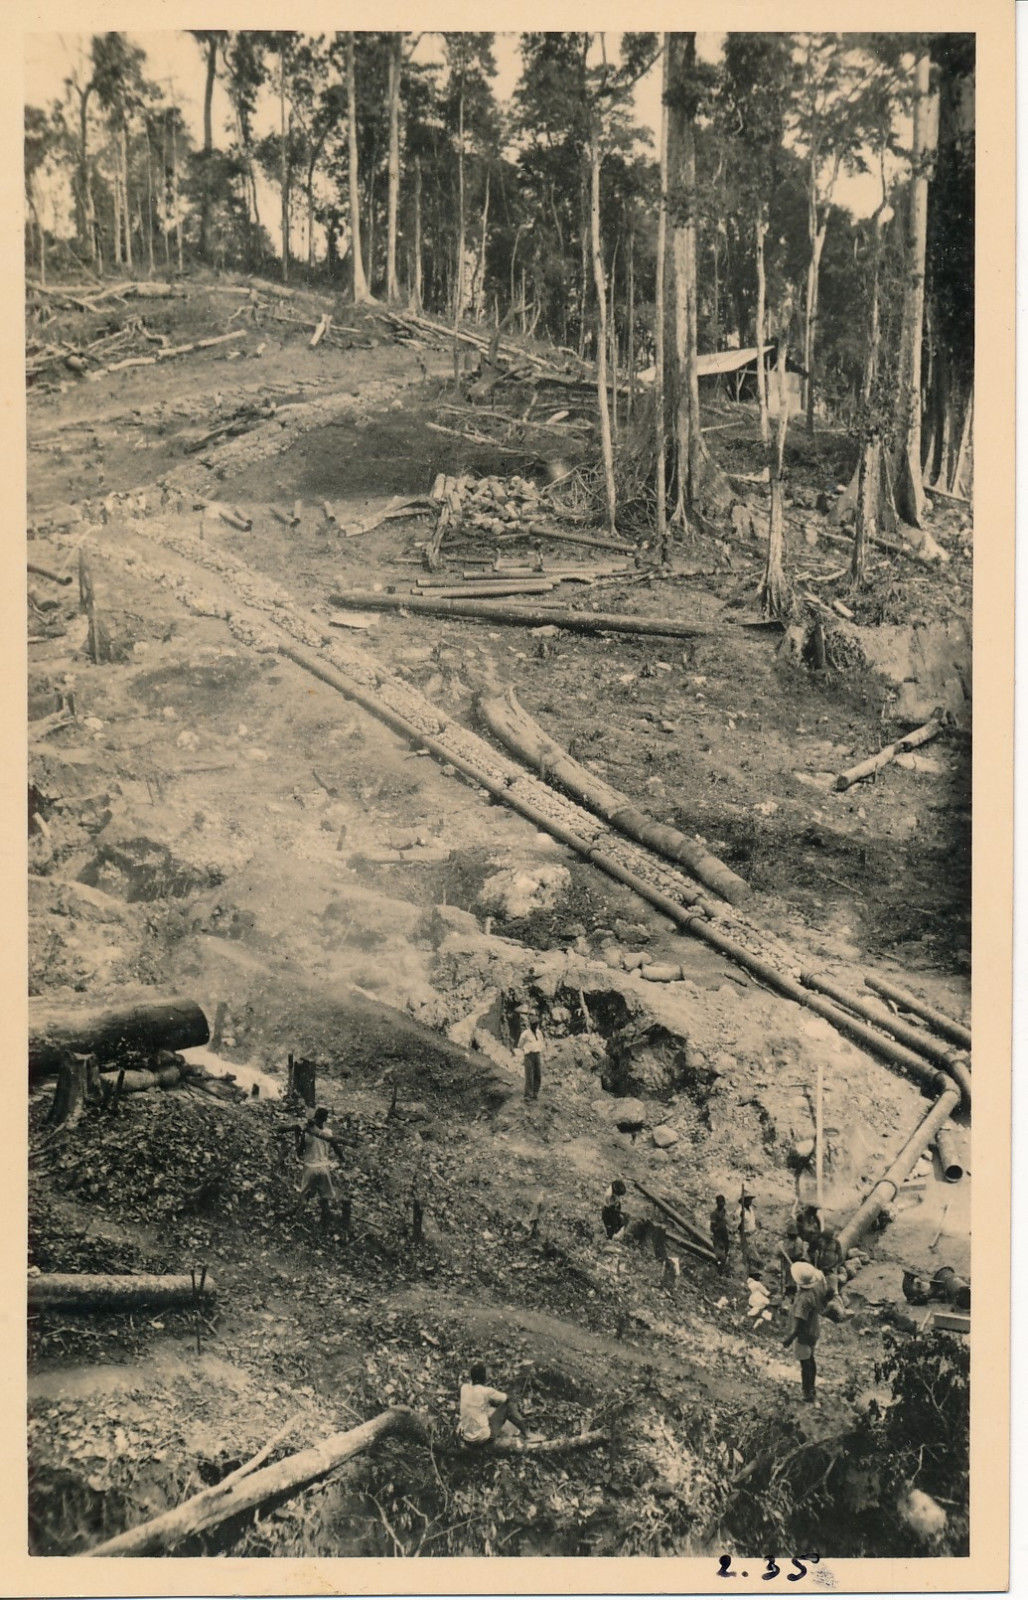 02.1935